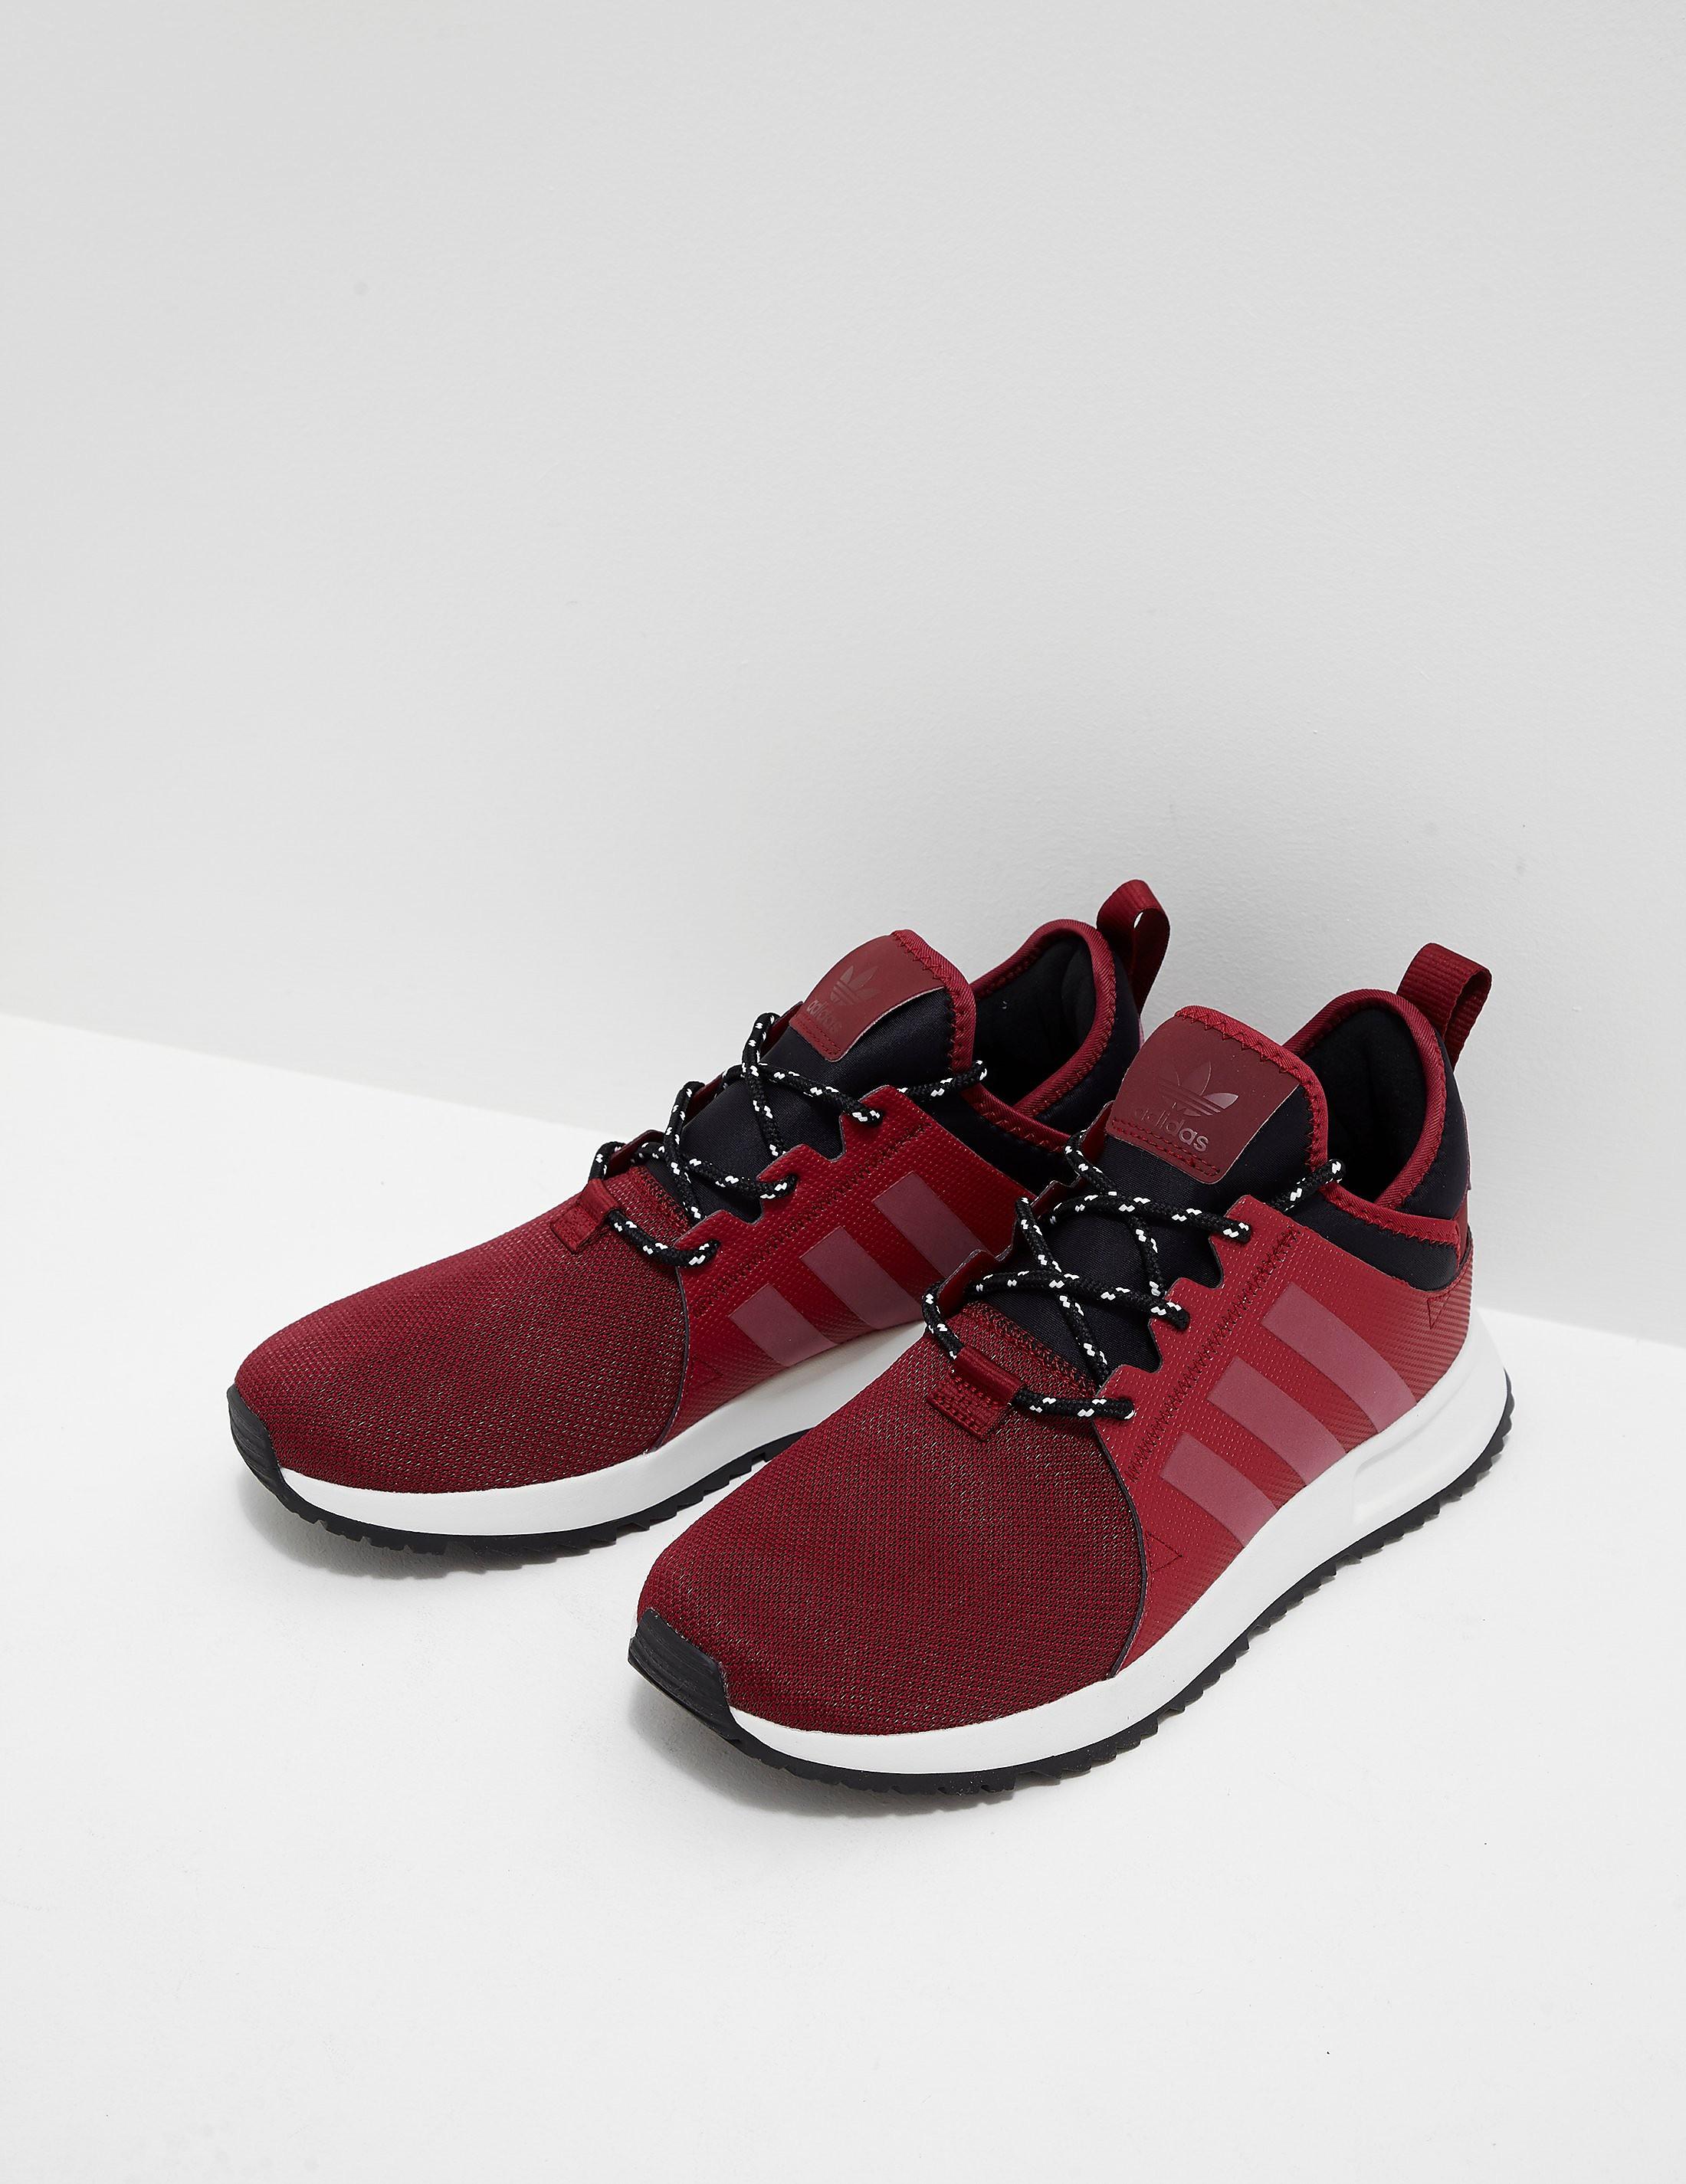 adidas Originals XPLR Sneakerboot